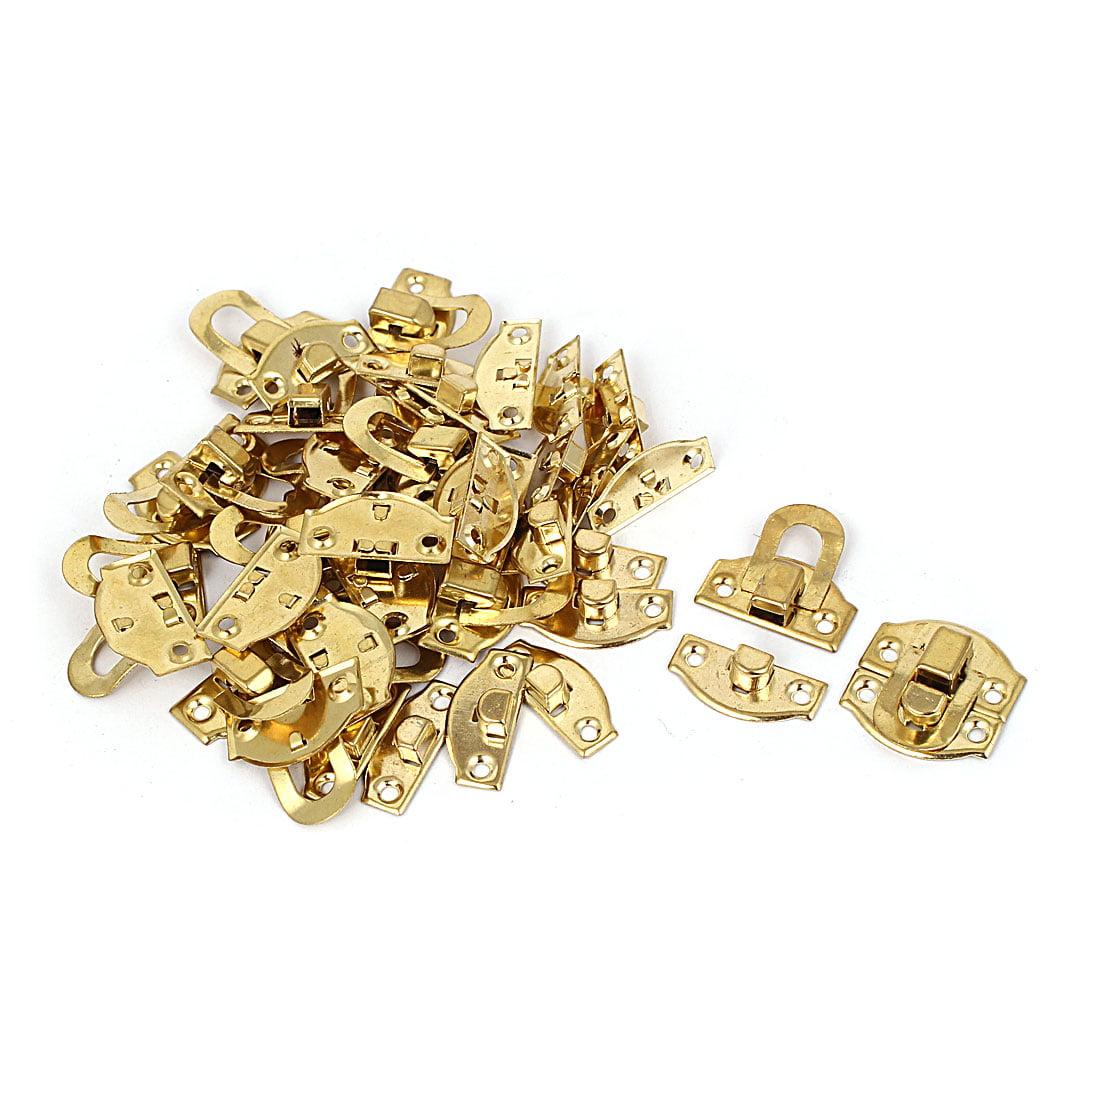 Suitcase Case Chest Box Decorative Lock Hasp Metal Toggle Latch Gold Tone 20pcs